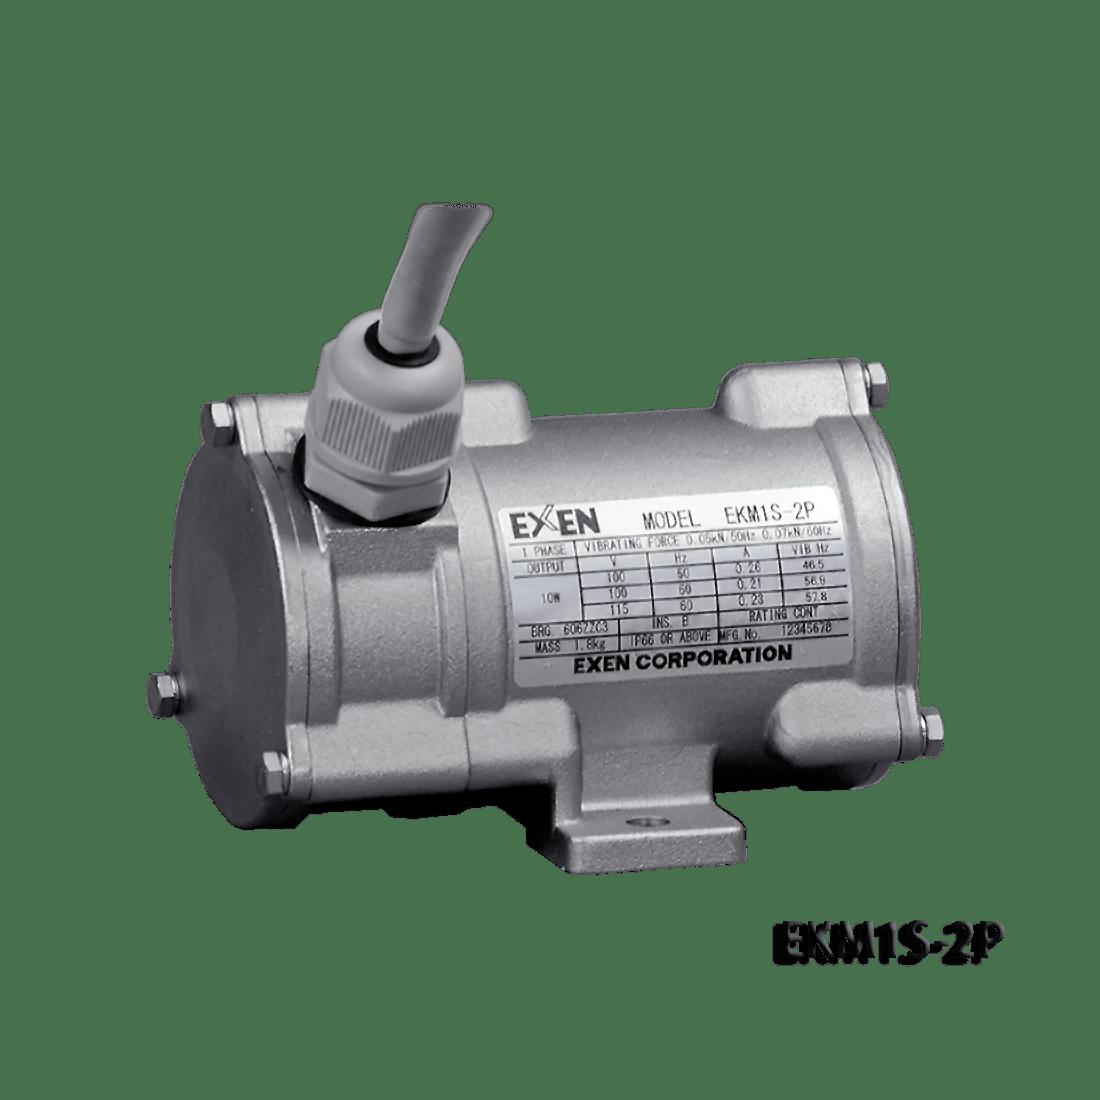 hight resolution of vibration motor ekm 2p series 2pole single phase 100v ekm1s 2p type